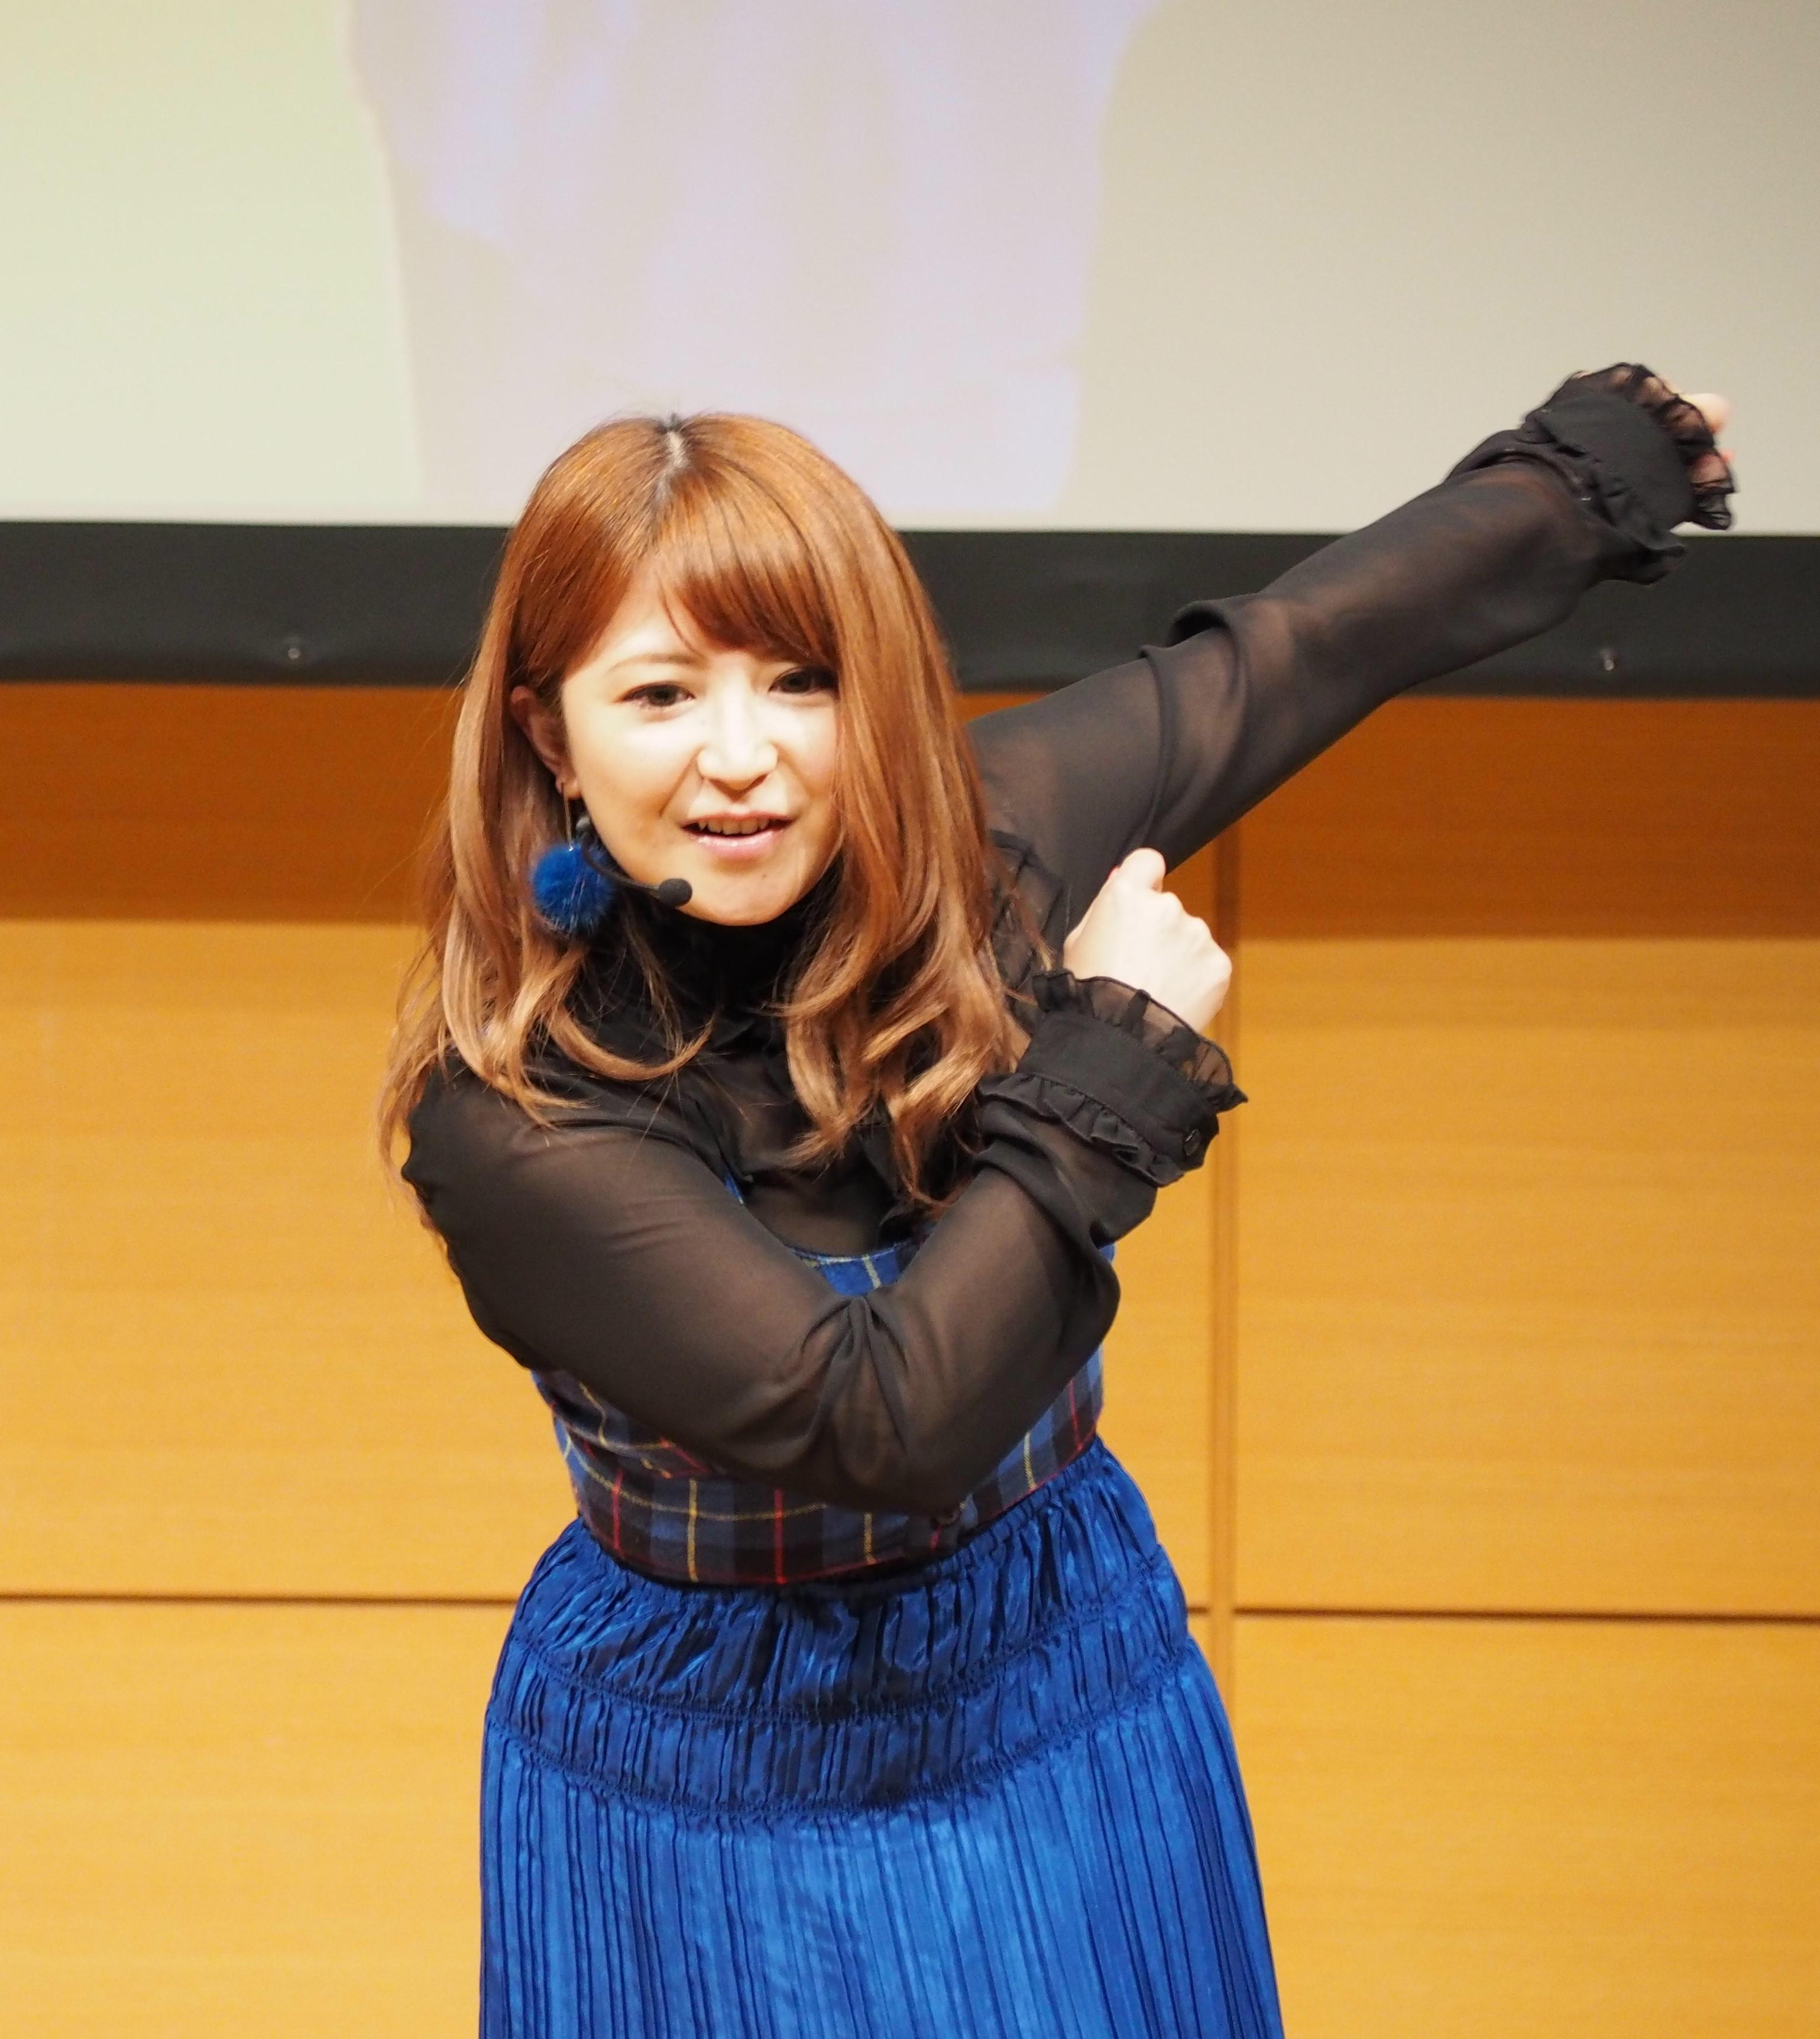 http://news.yoshimoto.co.jp/20180131220544-5fd7a7e91a76483c3fa69a40e9447aa187891881.jpg